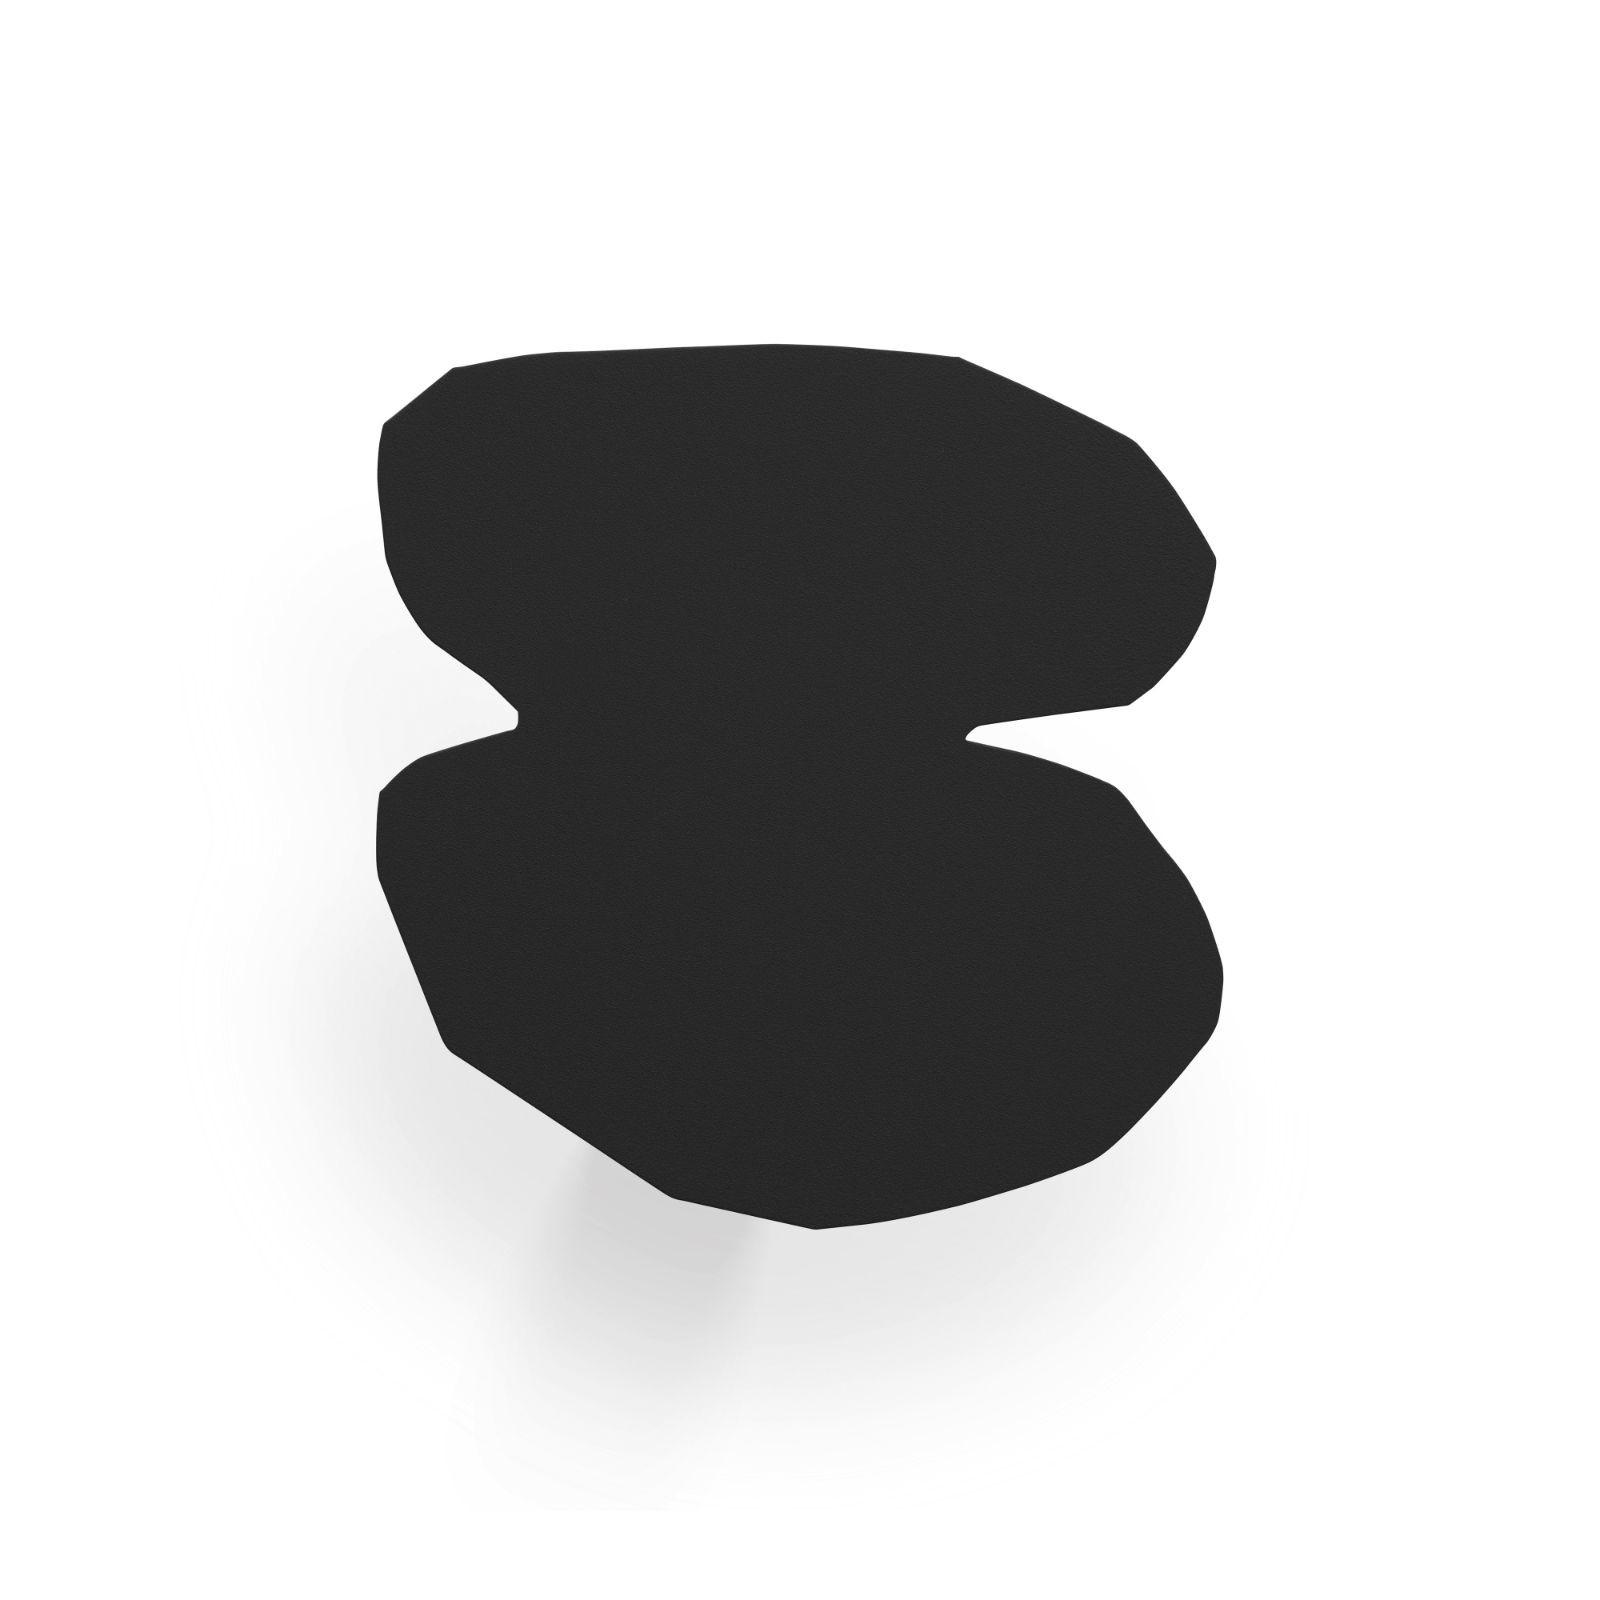 ENRI04 Coat Hook (Black) - Presse Citron